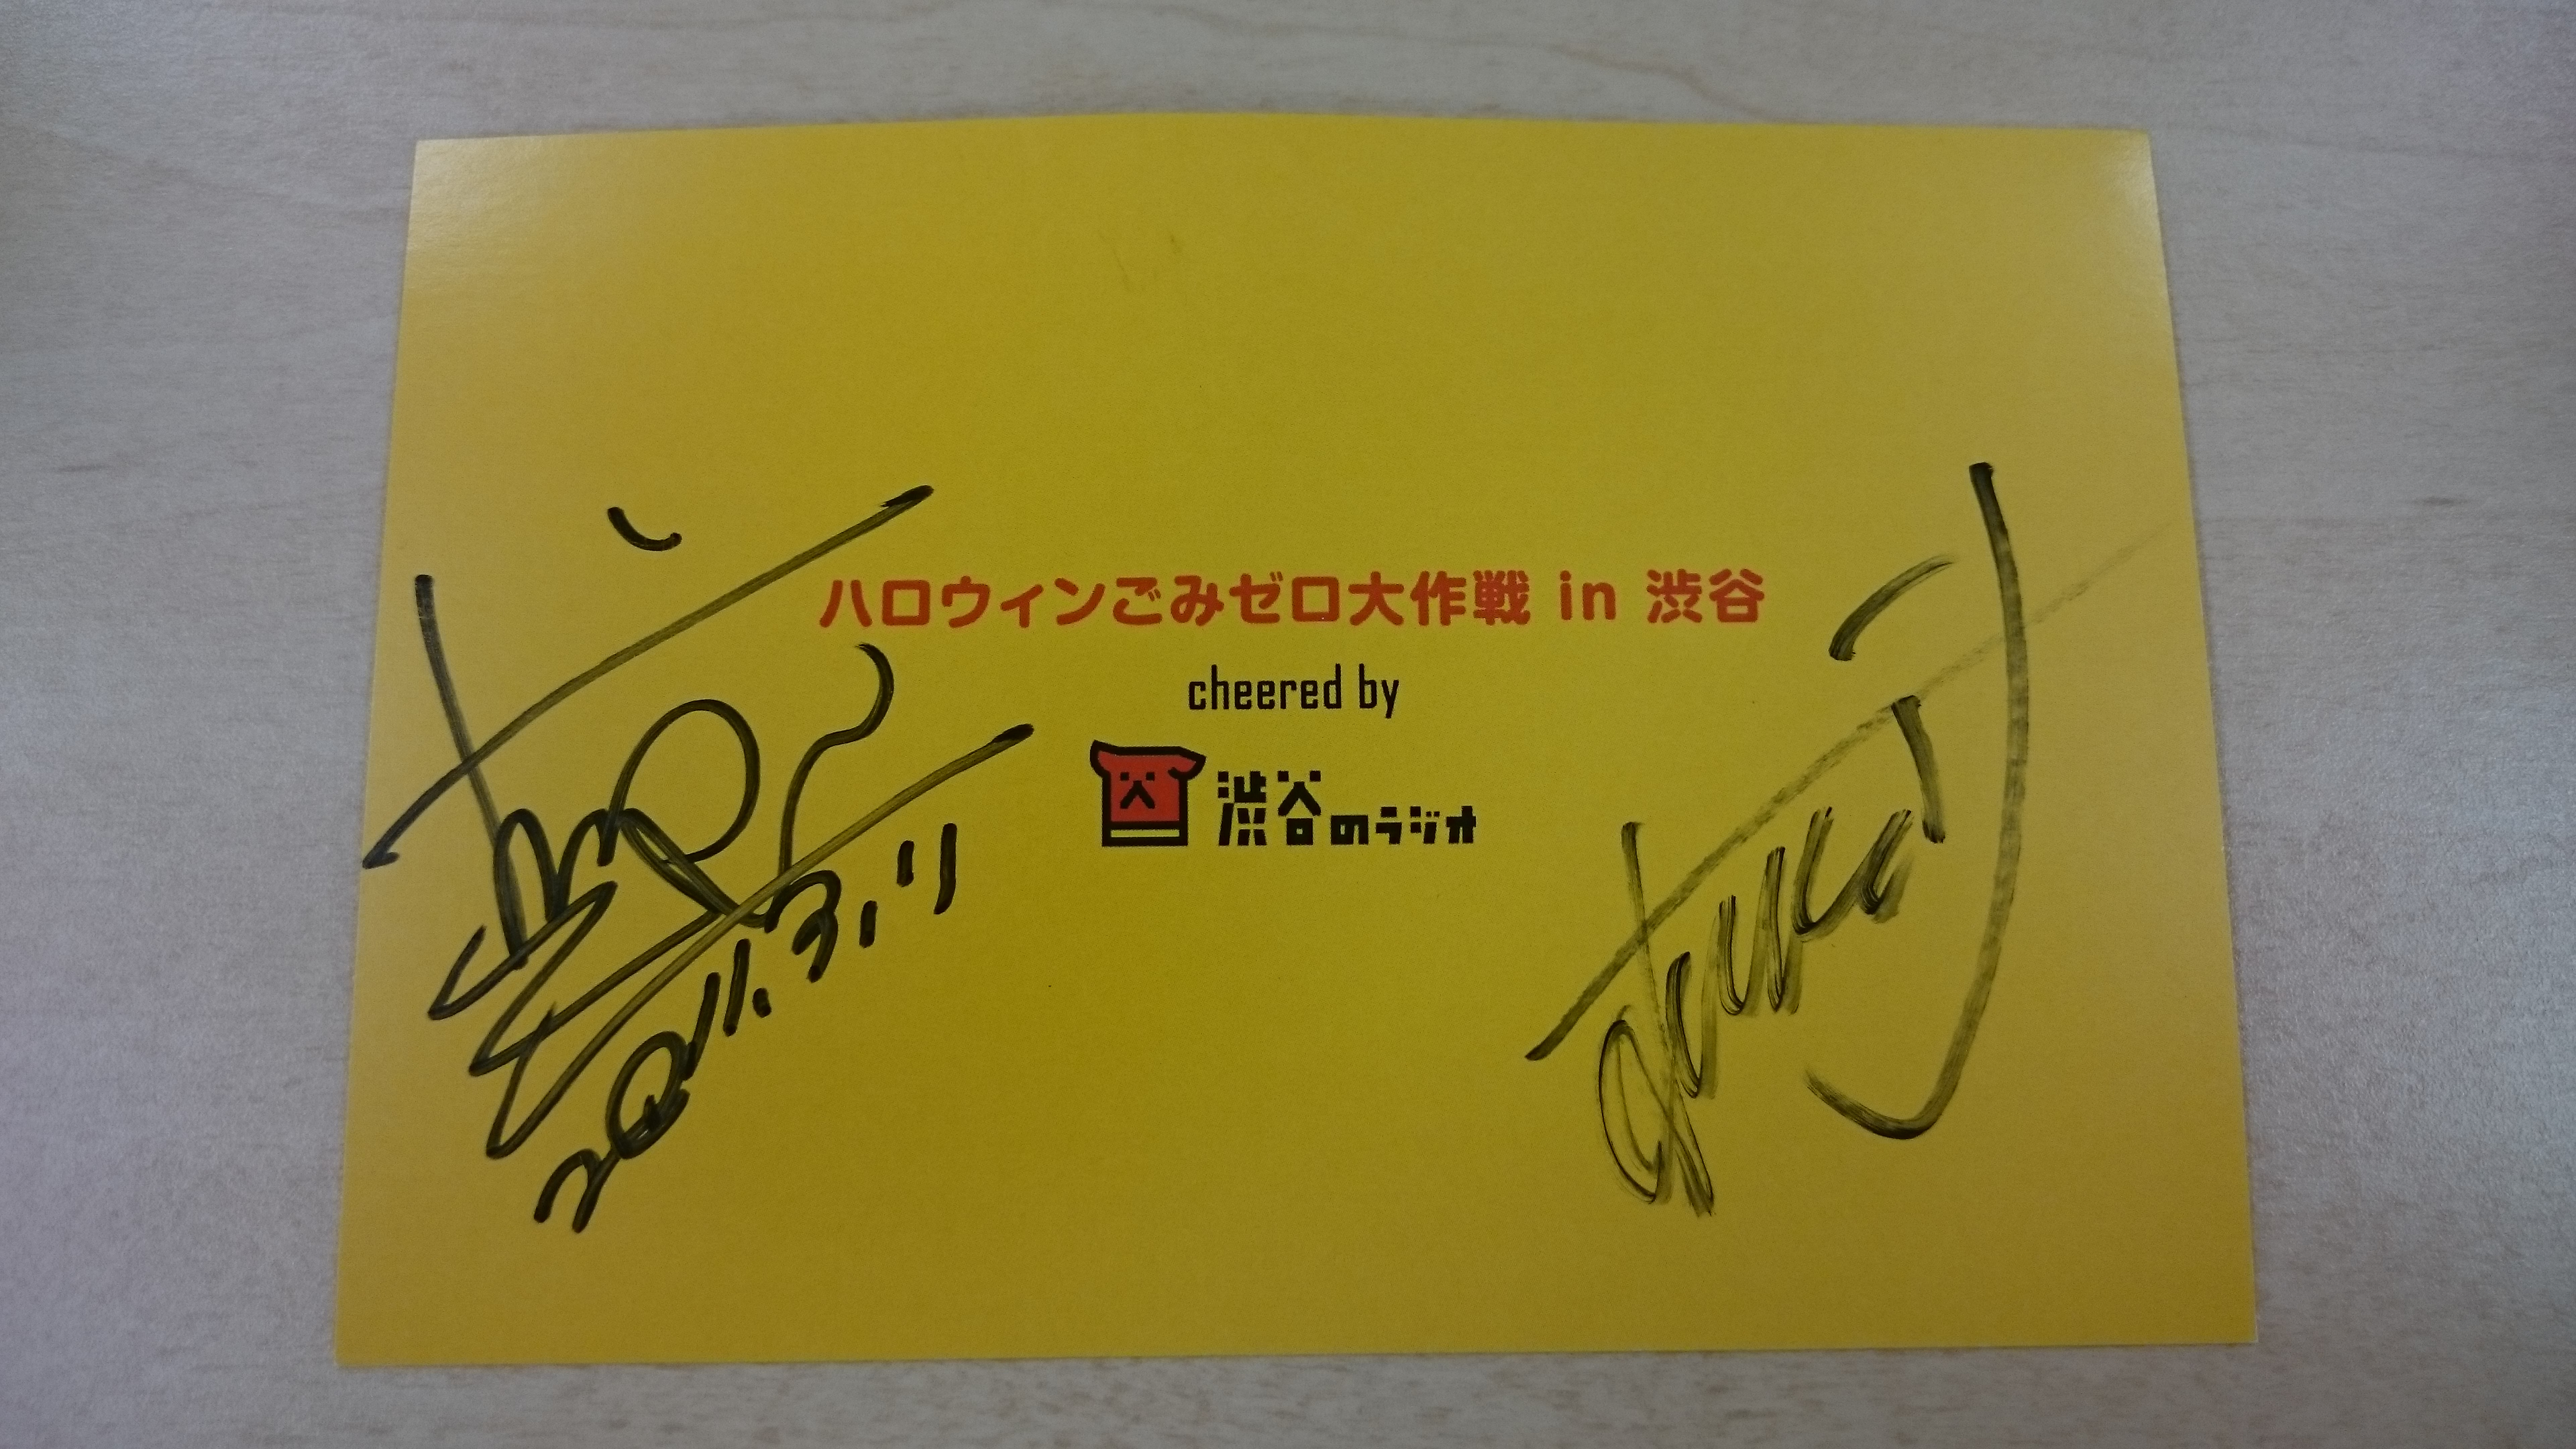 TOSHI-LOW&ホリエアツシ.JPG width=